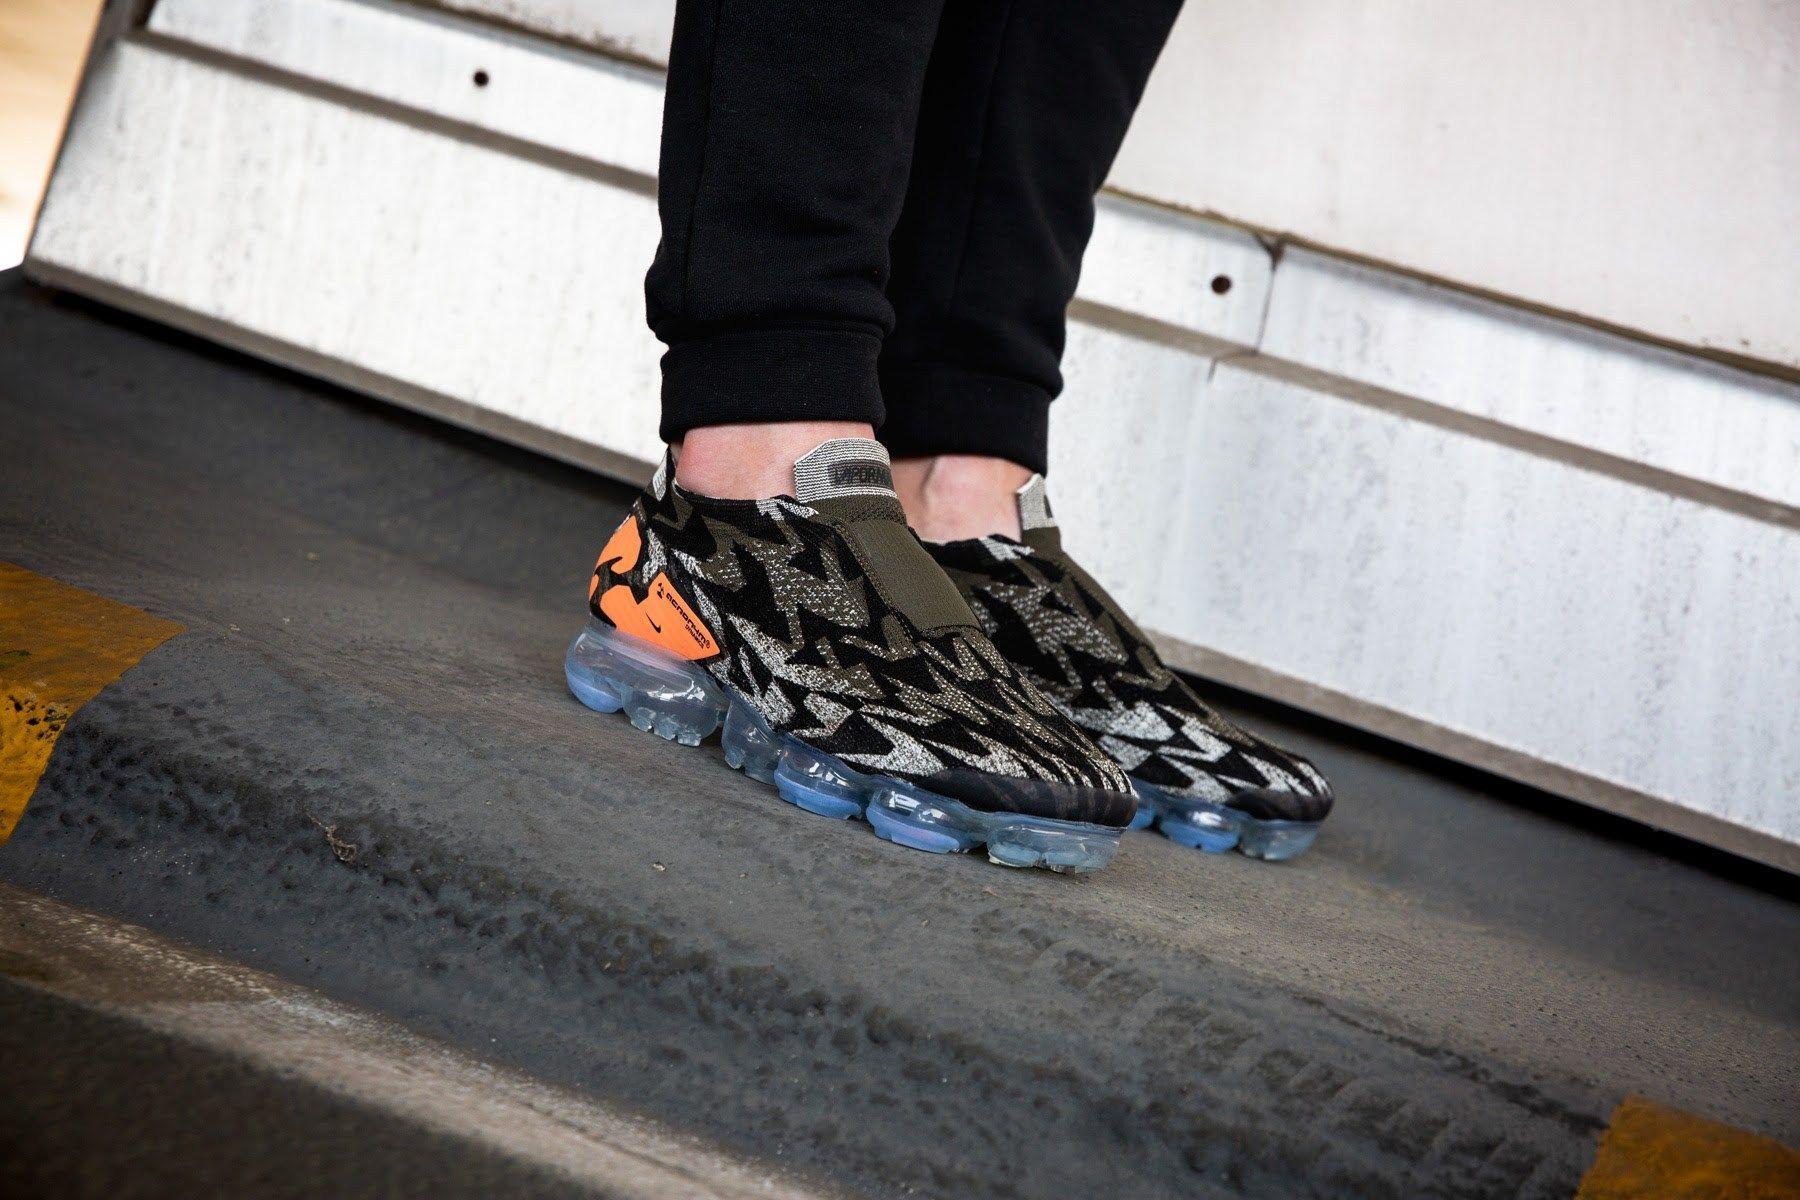 fba8ec25c1 ACRONYM x Nike Air VaporMax Flyknit Moc 2 Dark Stucco - EU Kicks: Sneaker  Magazine